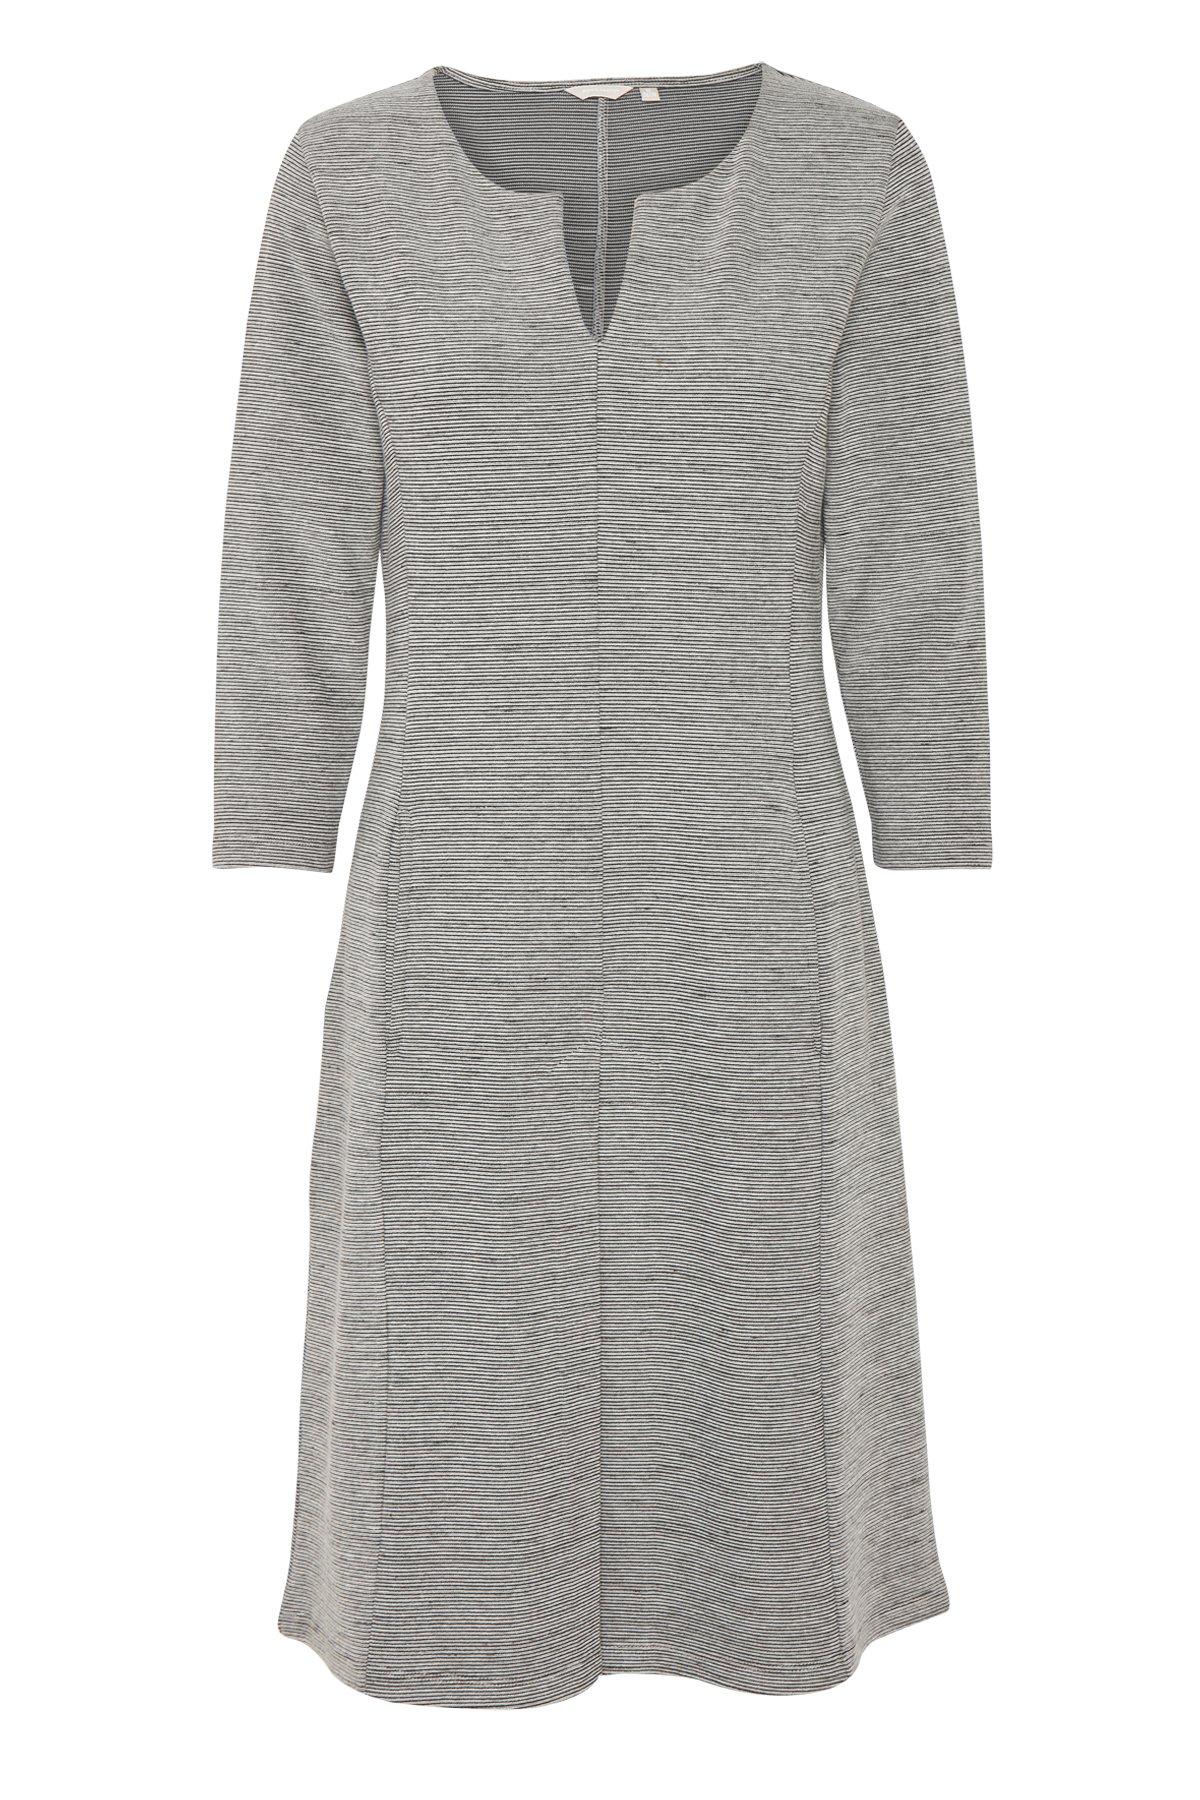 Hellgrau meliert Kleid von Bon'A Parte – Shoppen Sie Hellgrau meliert Kleid ab Gr. S-2XL hier